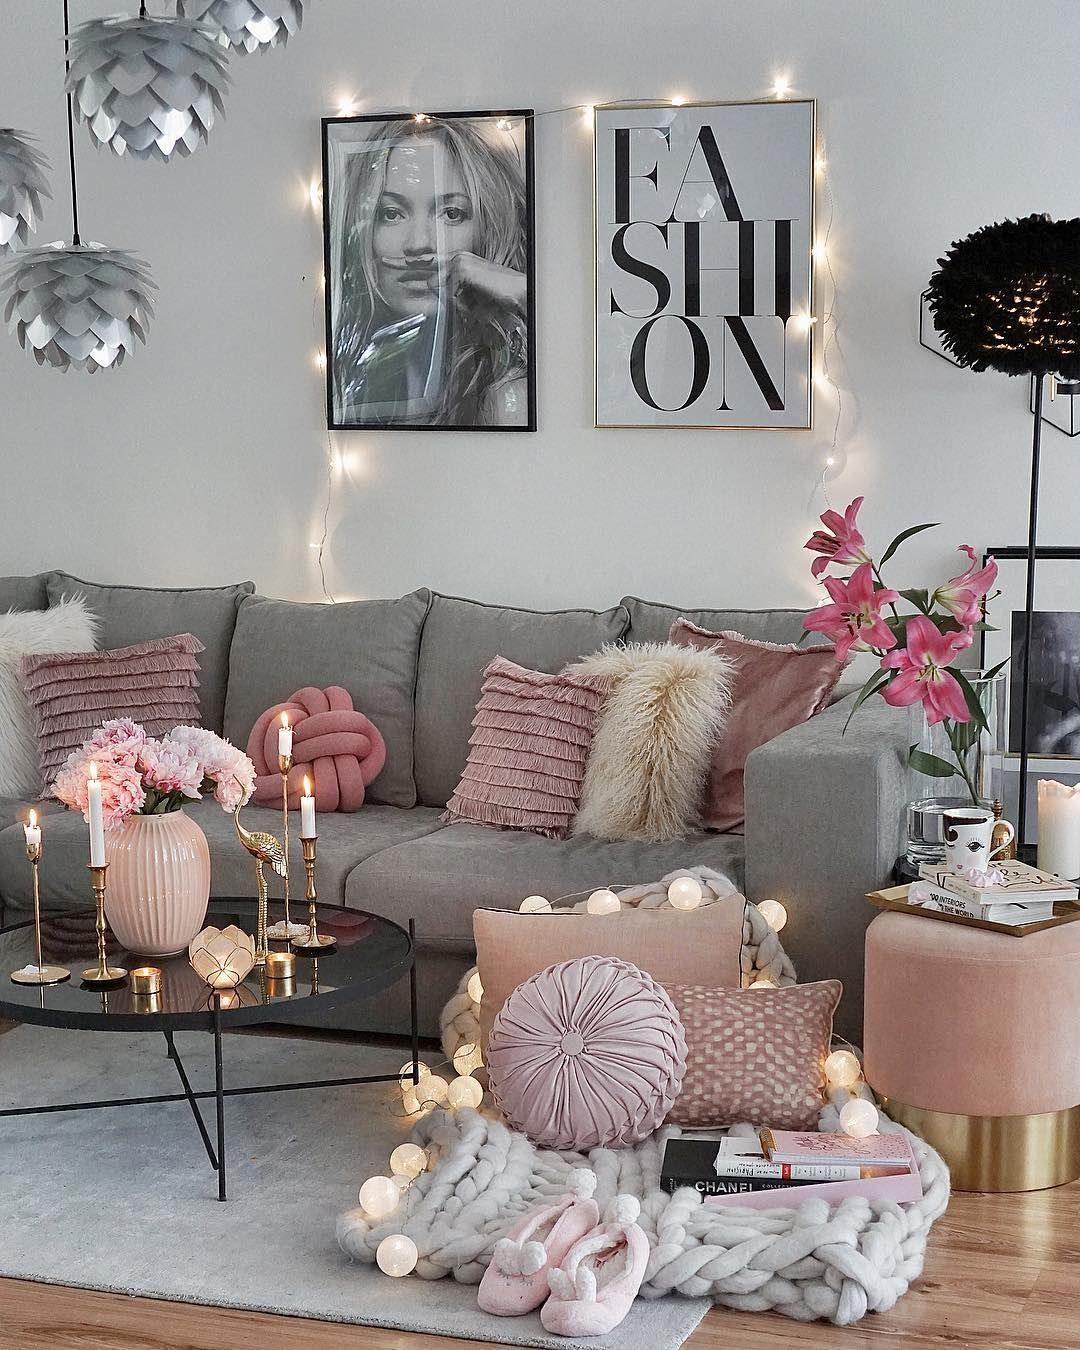 51 Ultimate Romantic Living Room Decor Ideas Roundecor Romantic Living Room Small Living Room Decor Romantic Room Decoration